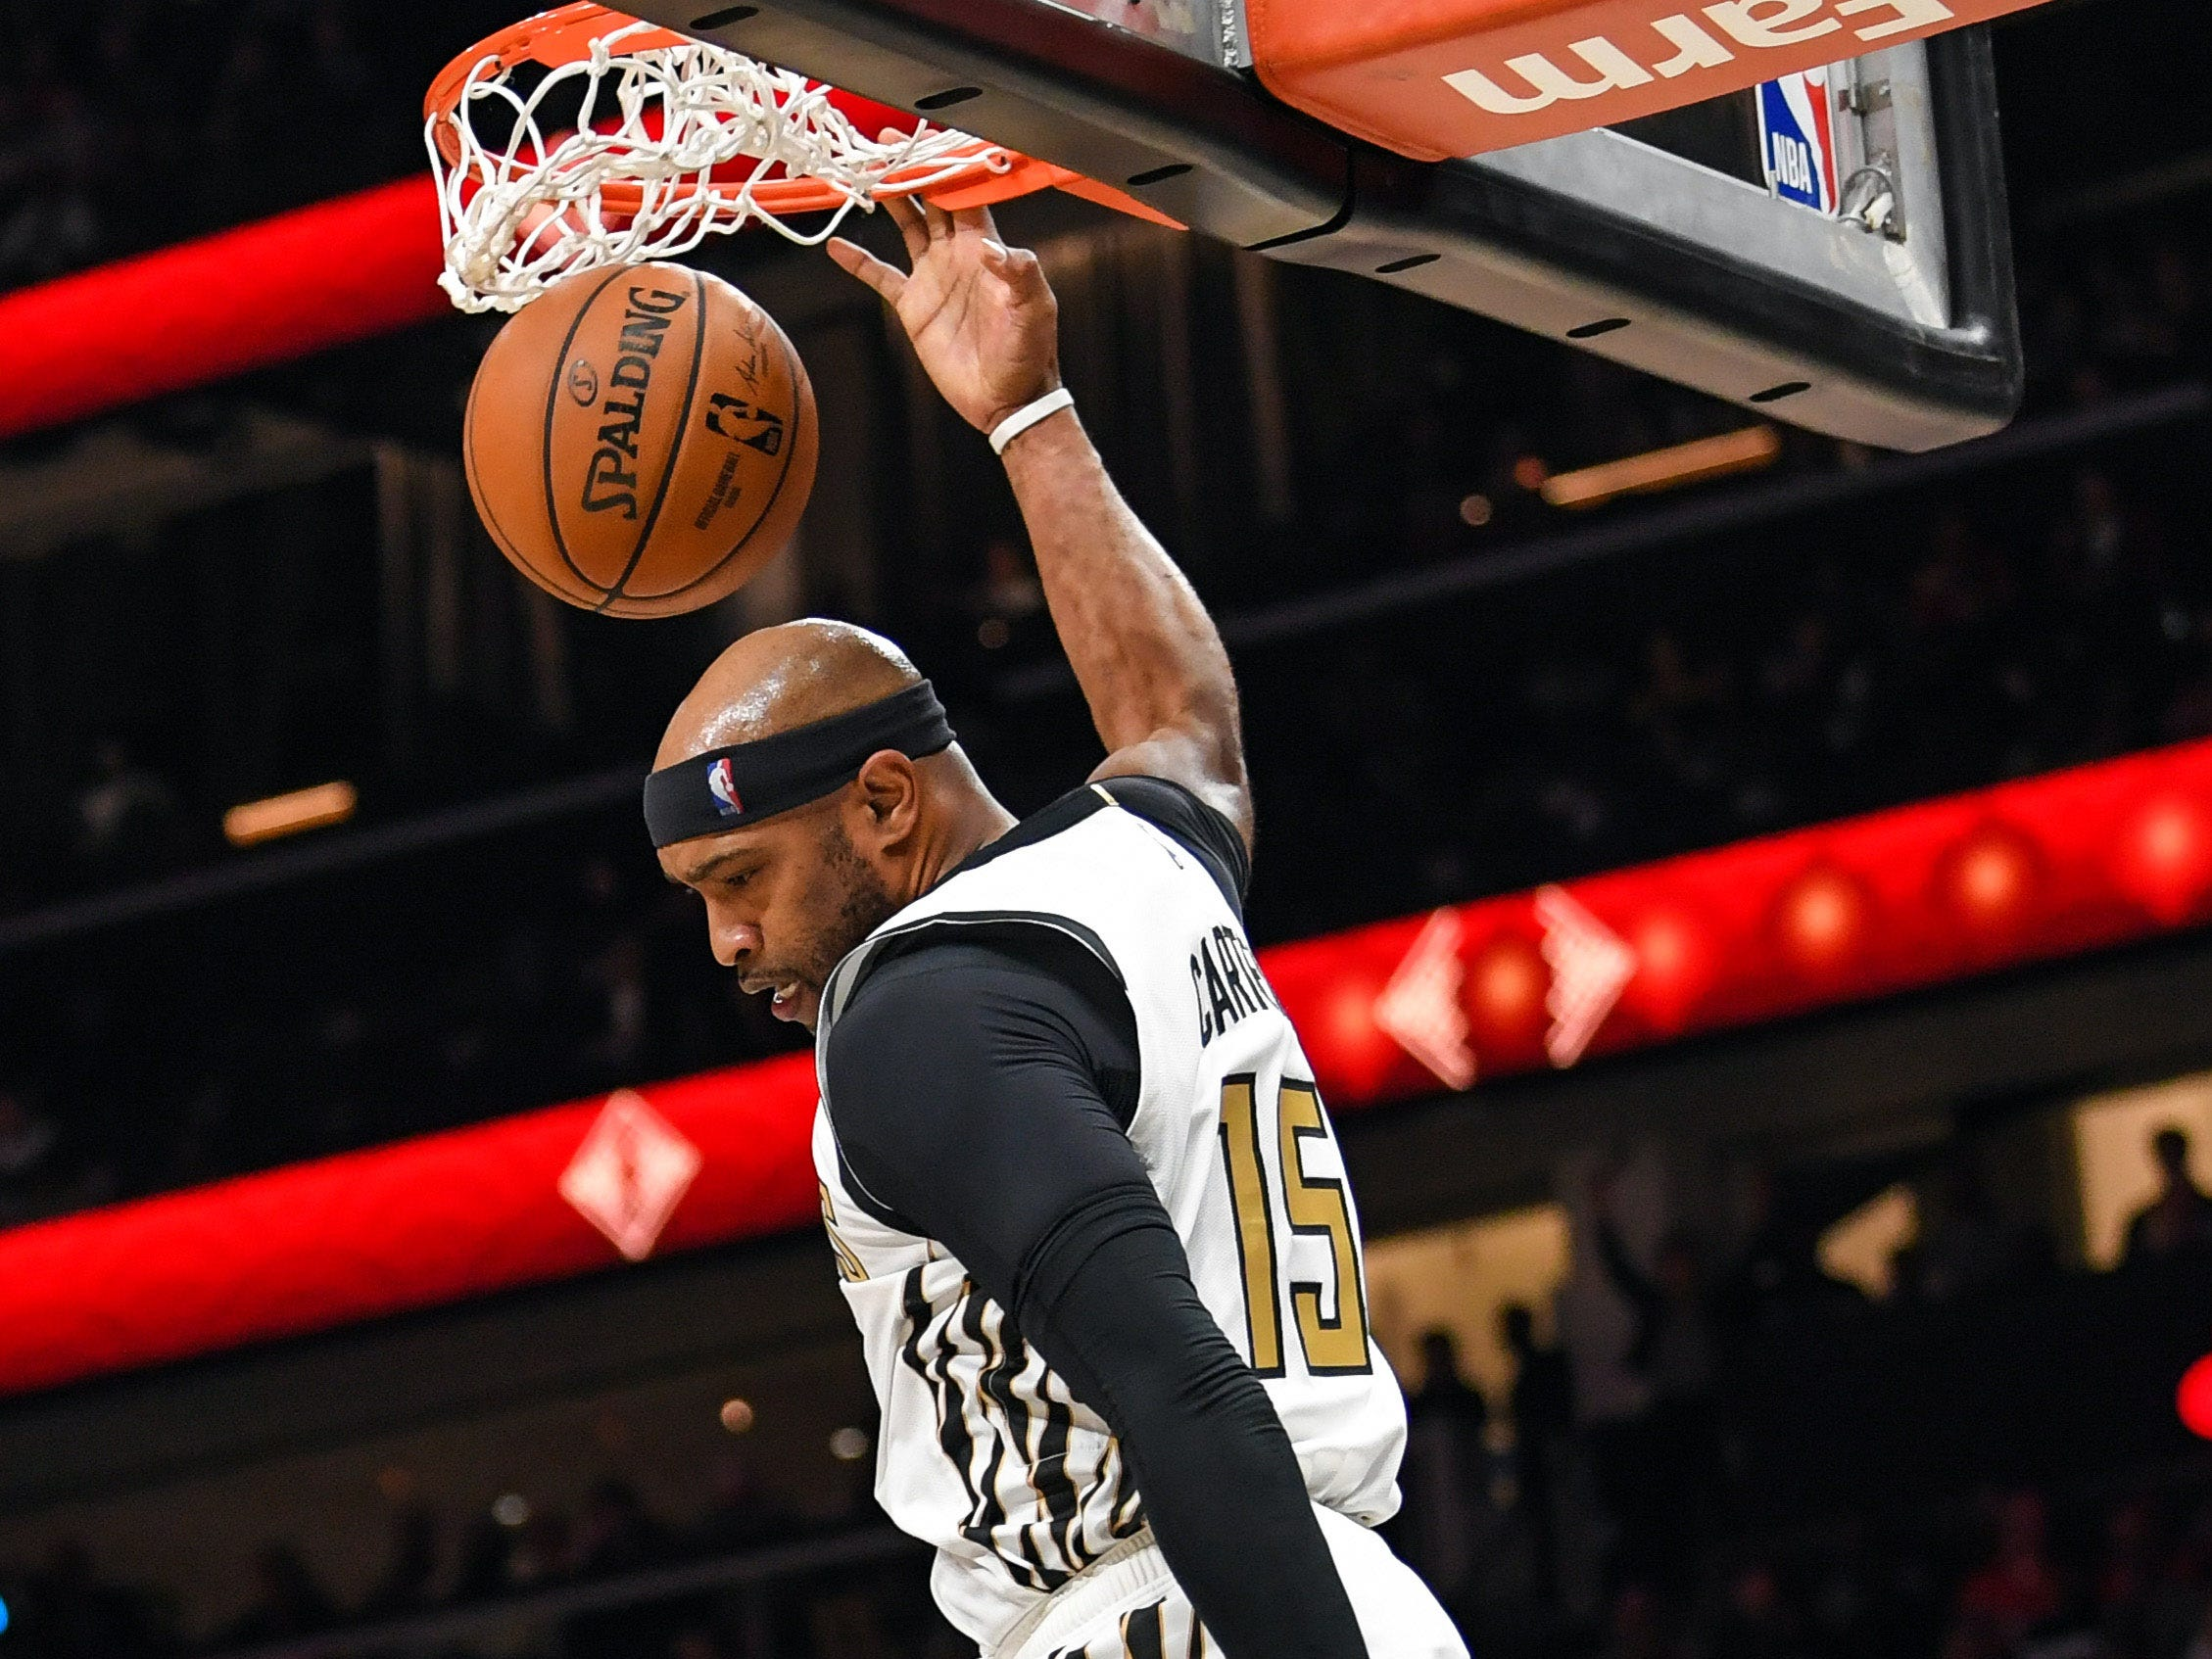 Feb. 7: Atlanta Hawks forward Vince Carter dunks against the Toronto Raptors.